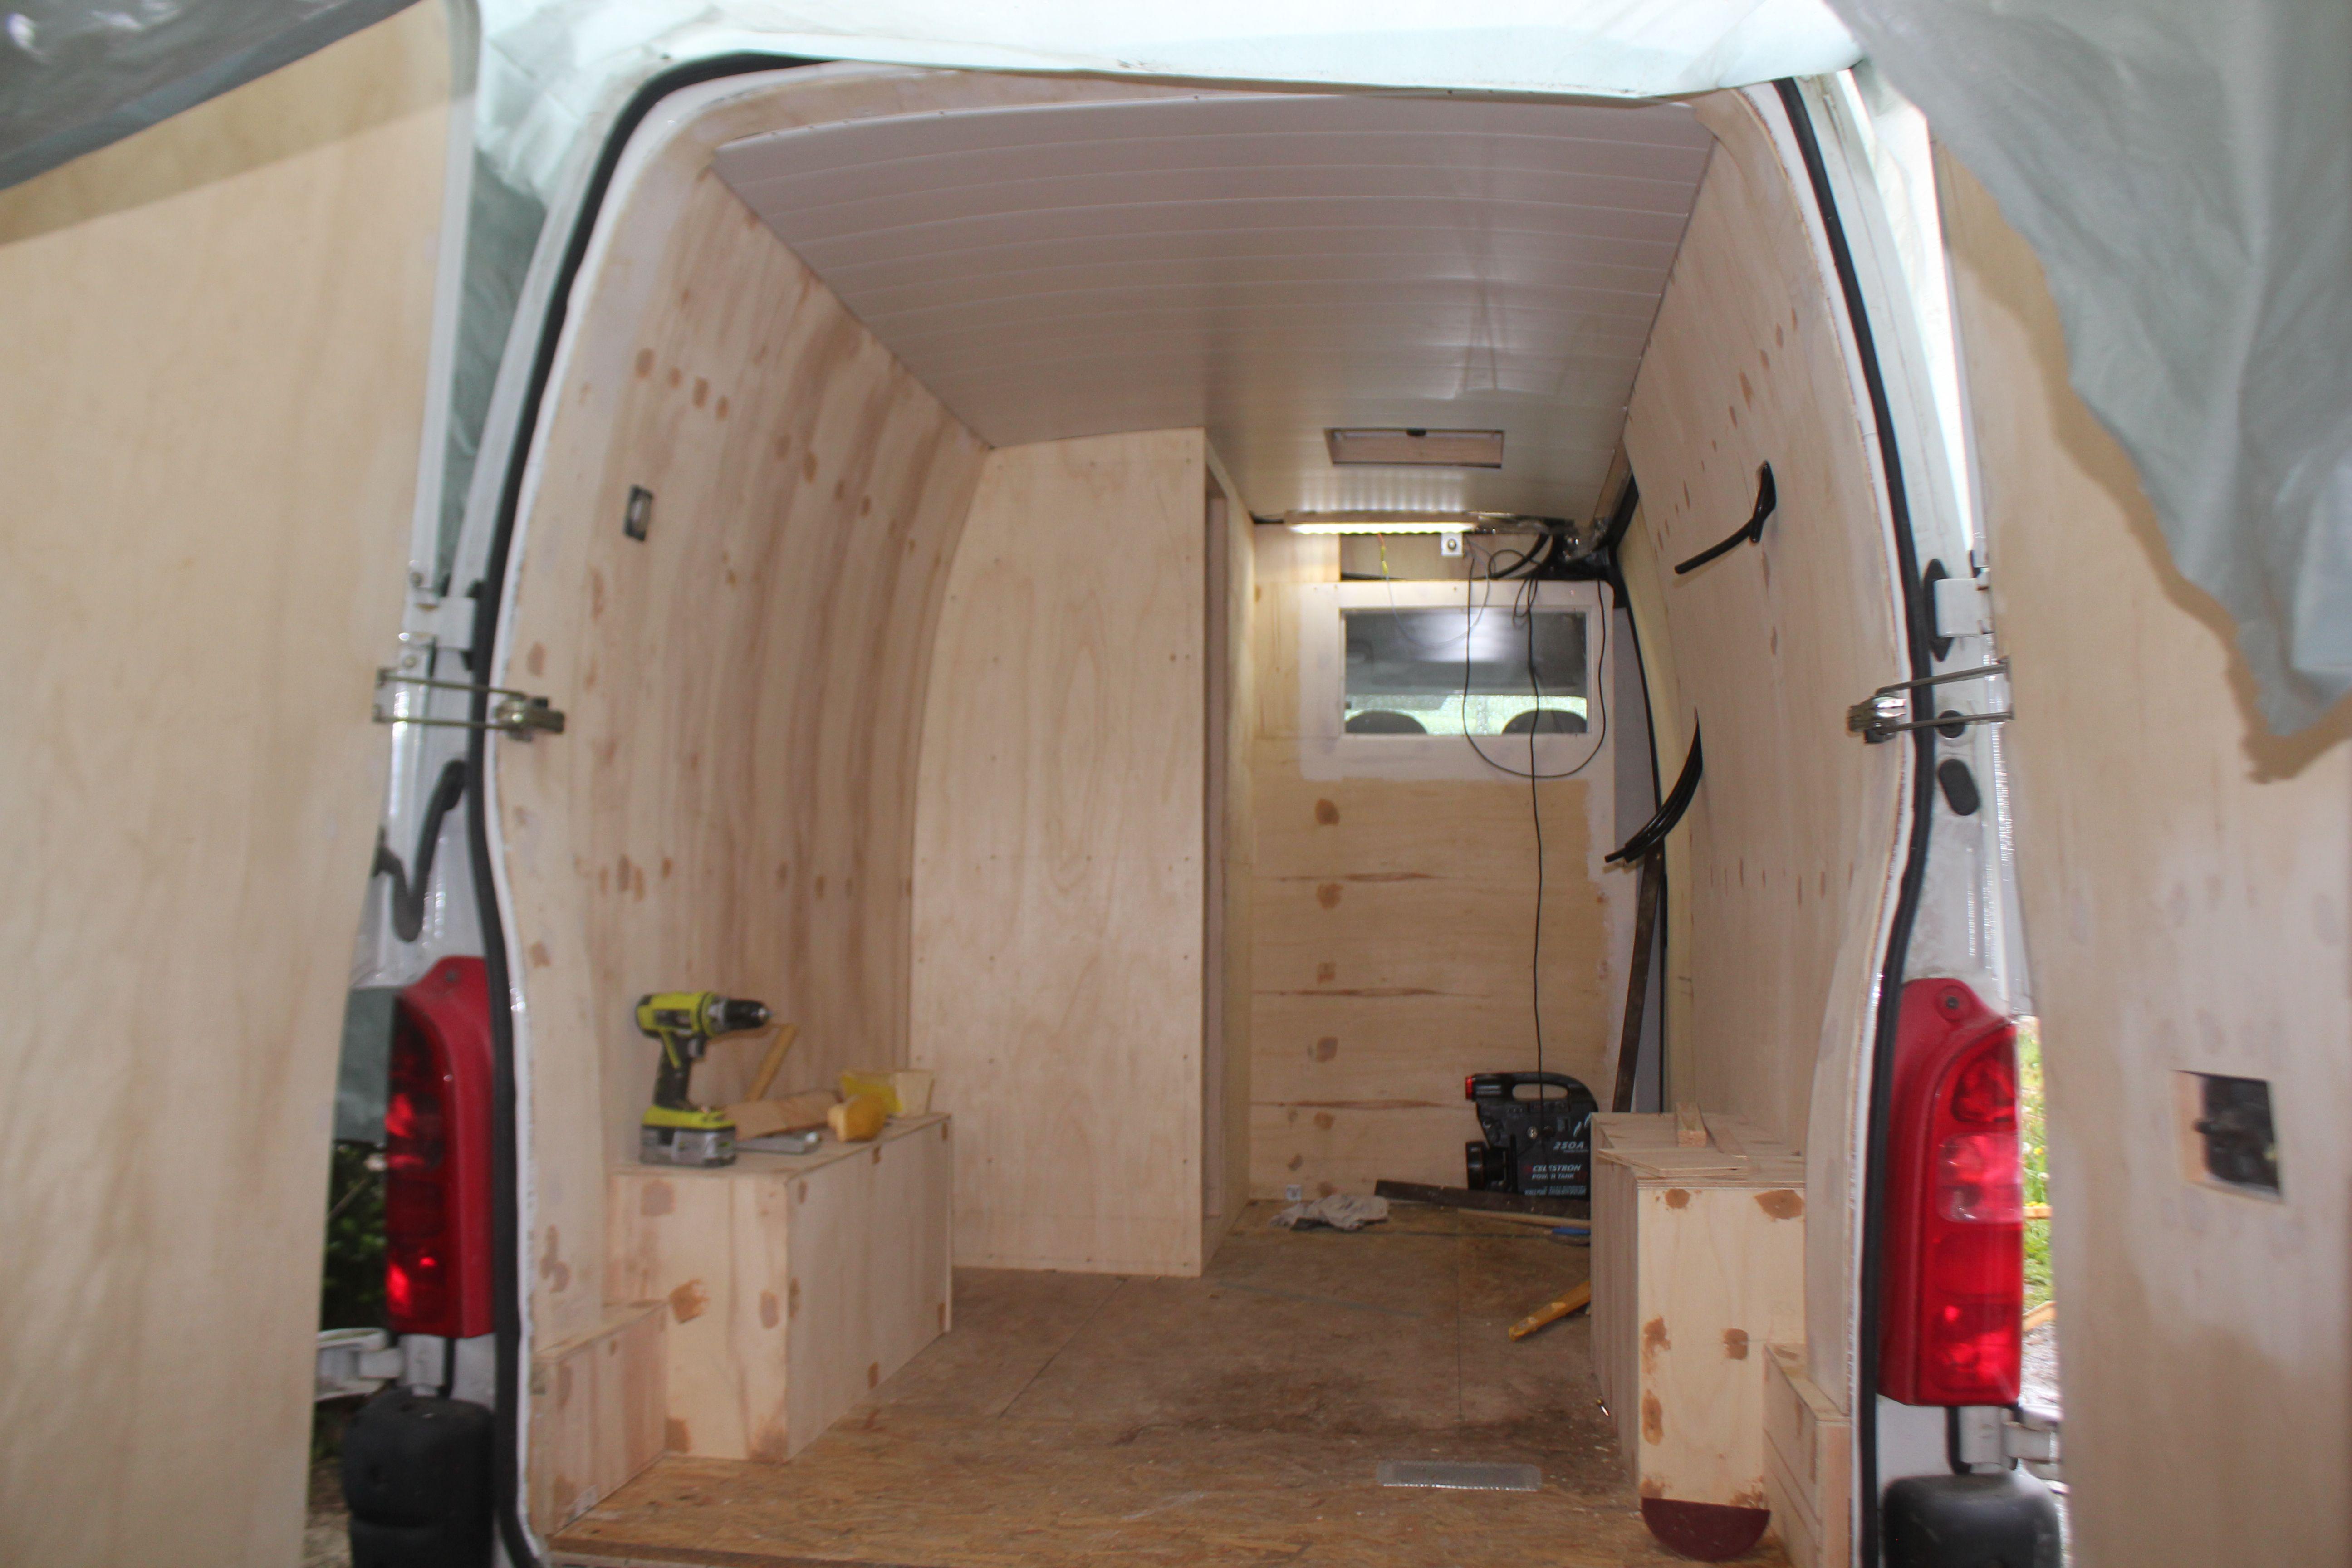 Cabine de douche fourgon pinterest fourgon fourgon am nag et camion amenager - Cabine de douche camping ...